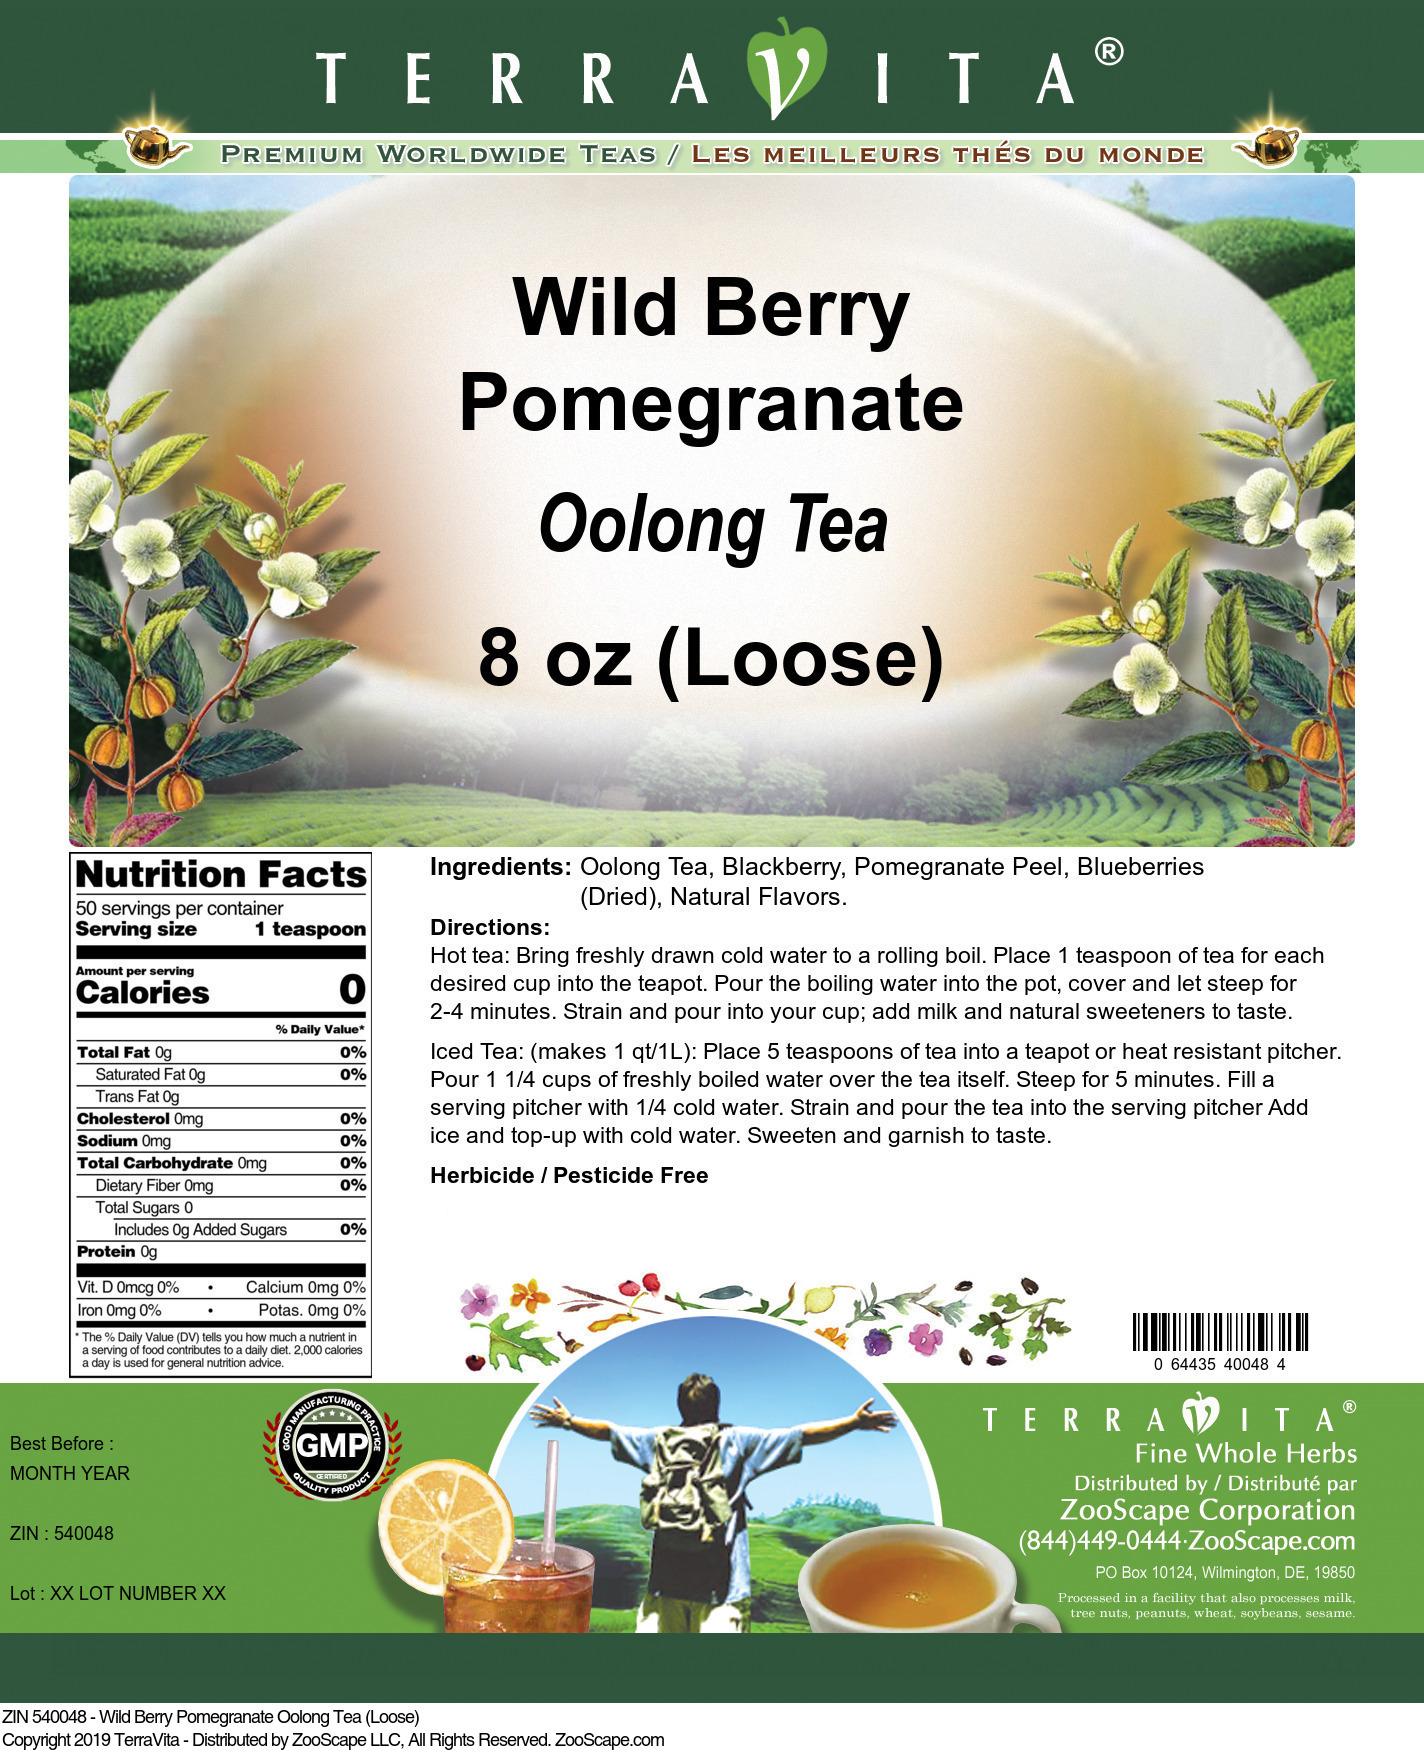 Wild Berry Pomegranate Oolong Tea